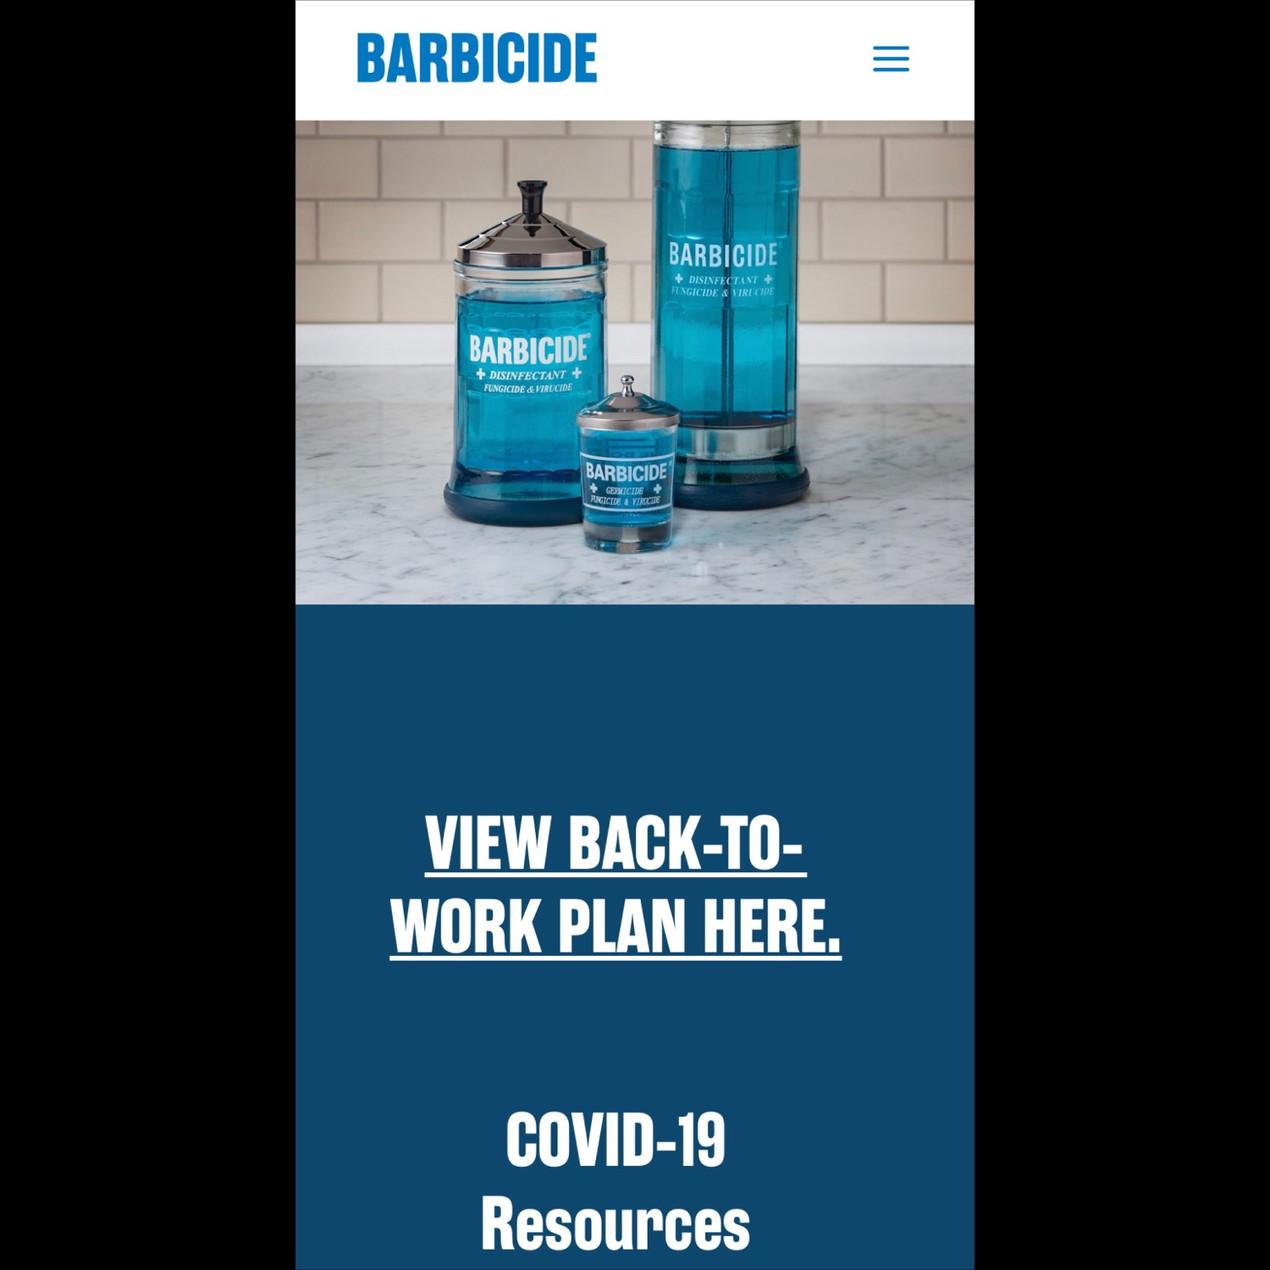 Barbicide Website